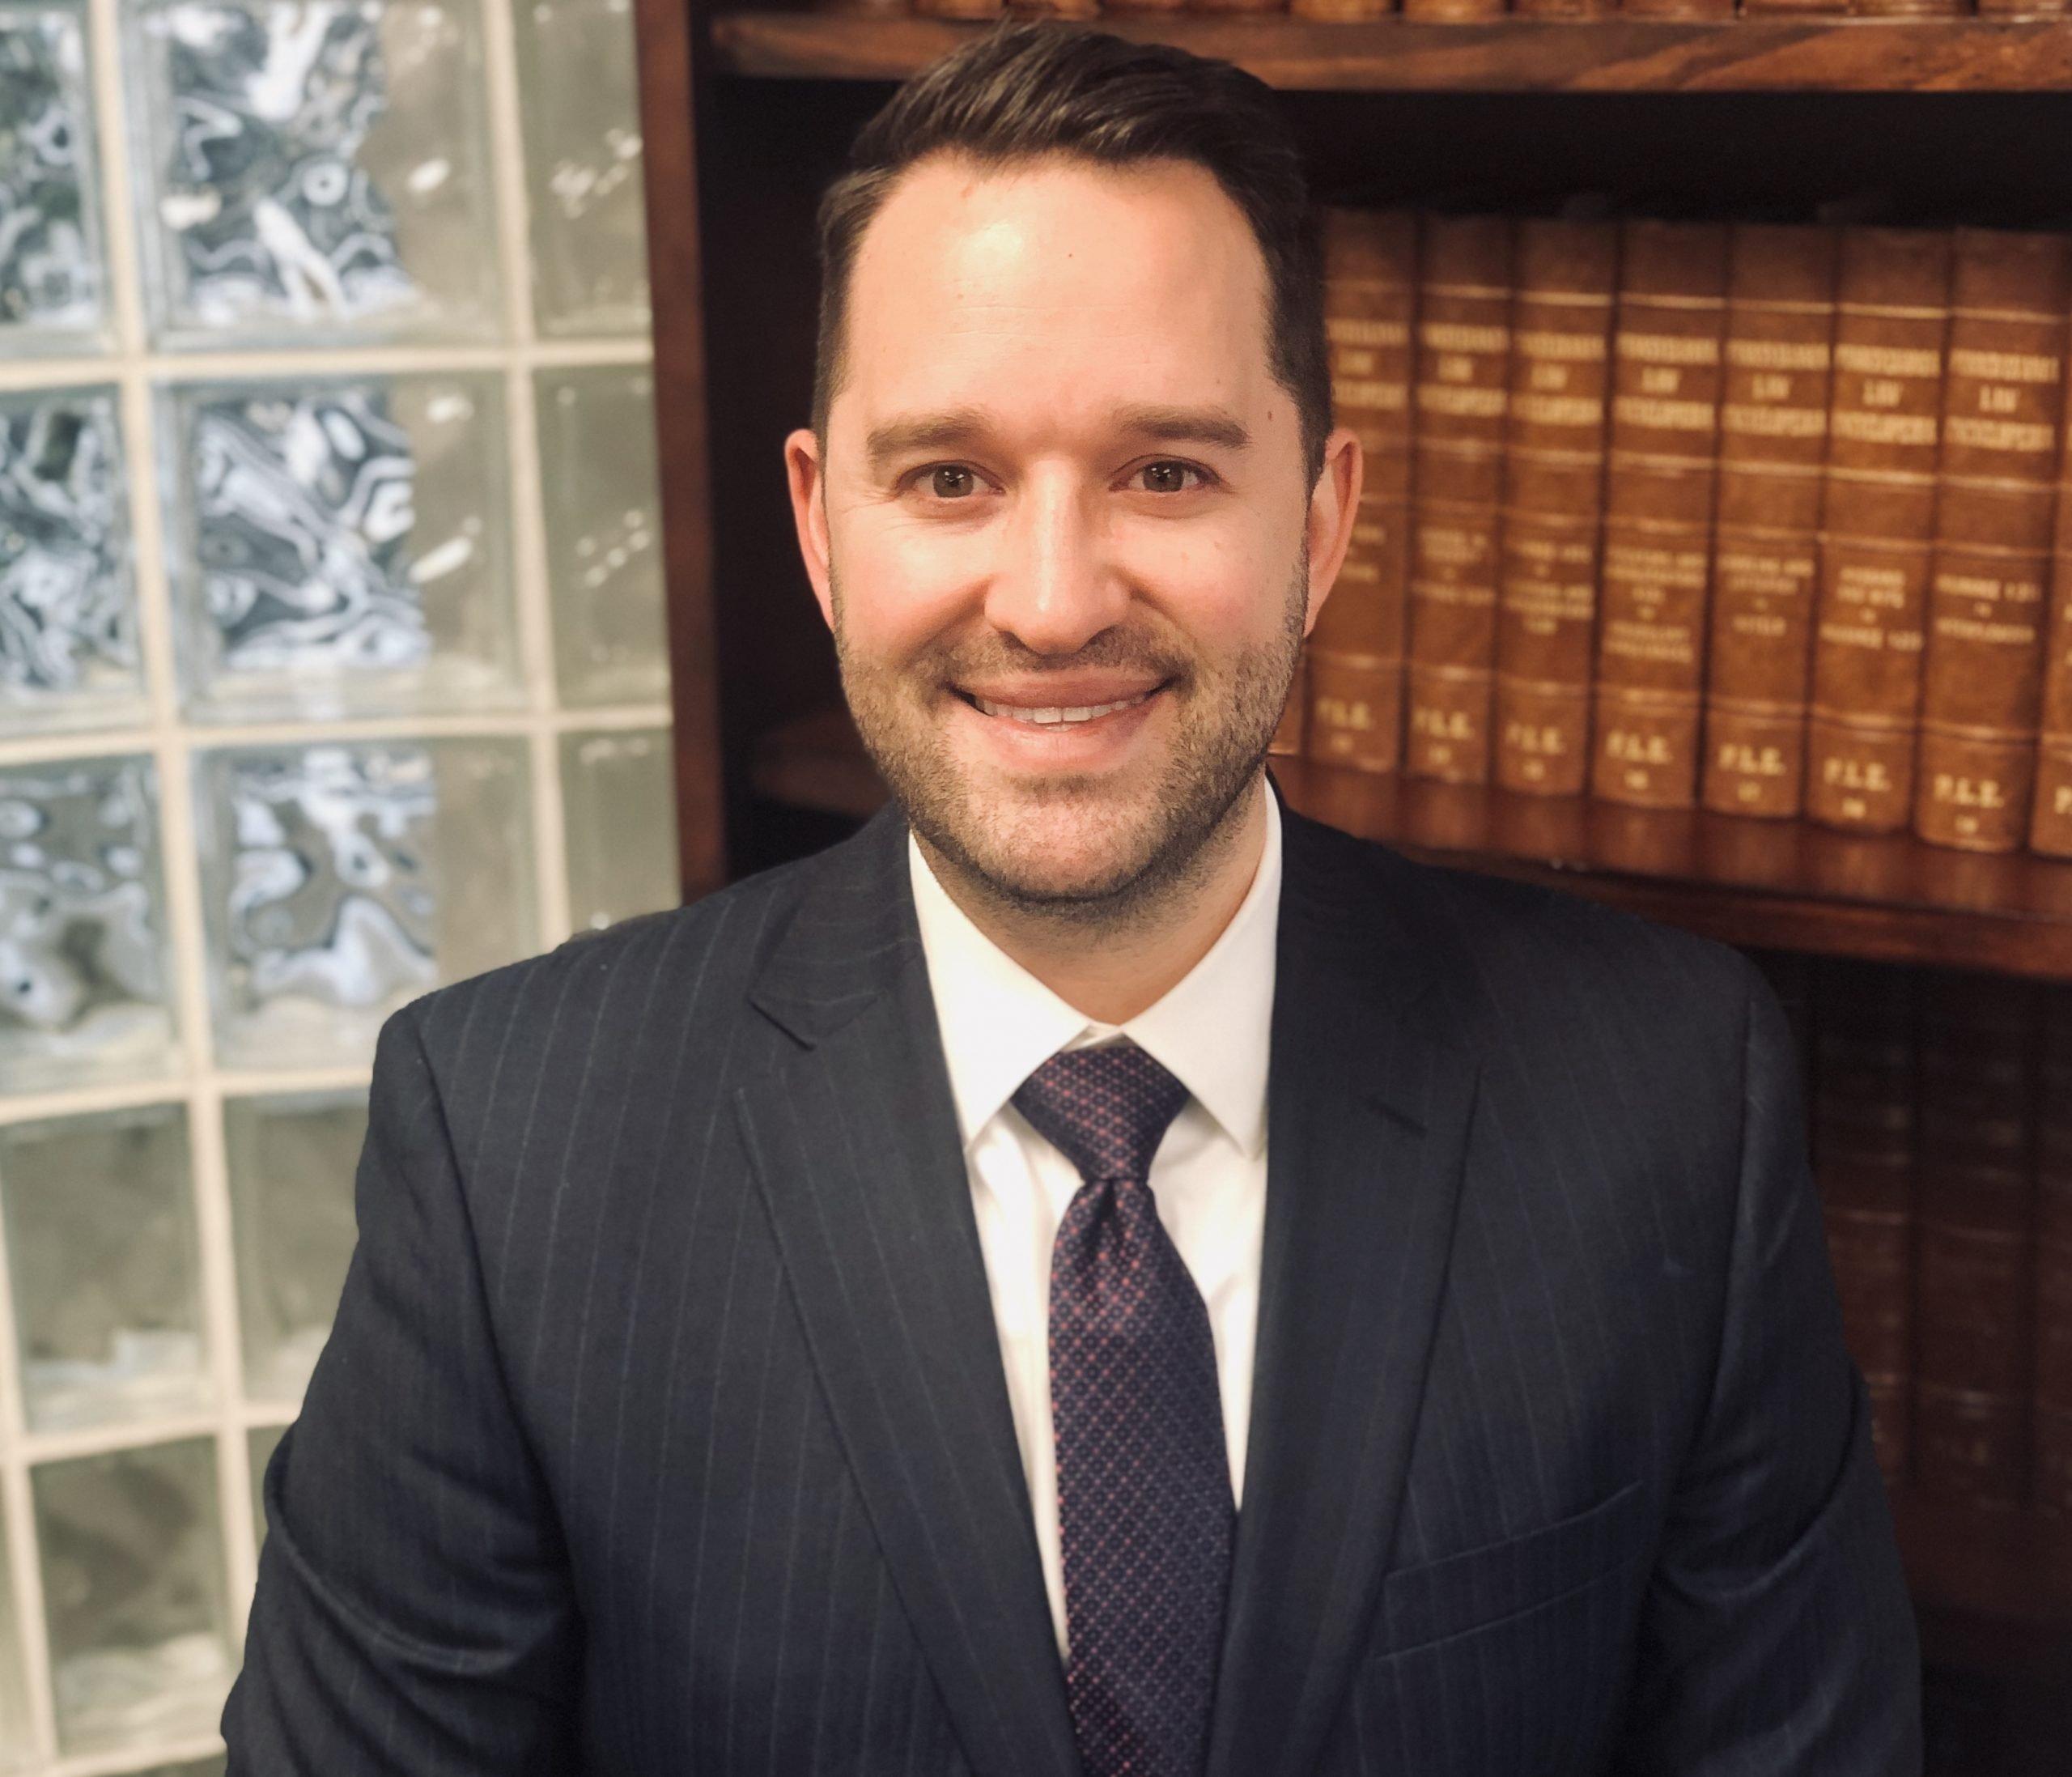 John W. Ament, Esquire, MBA